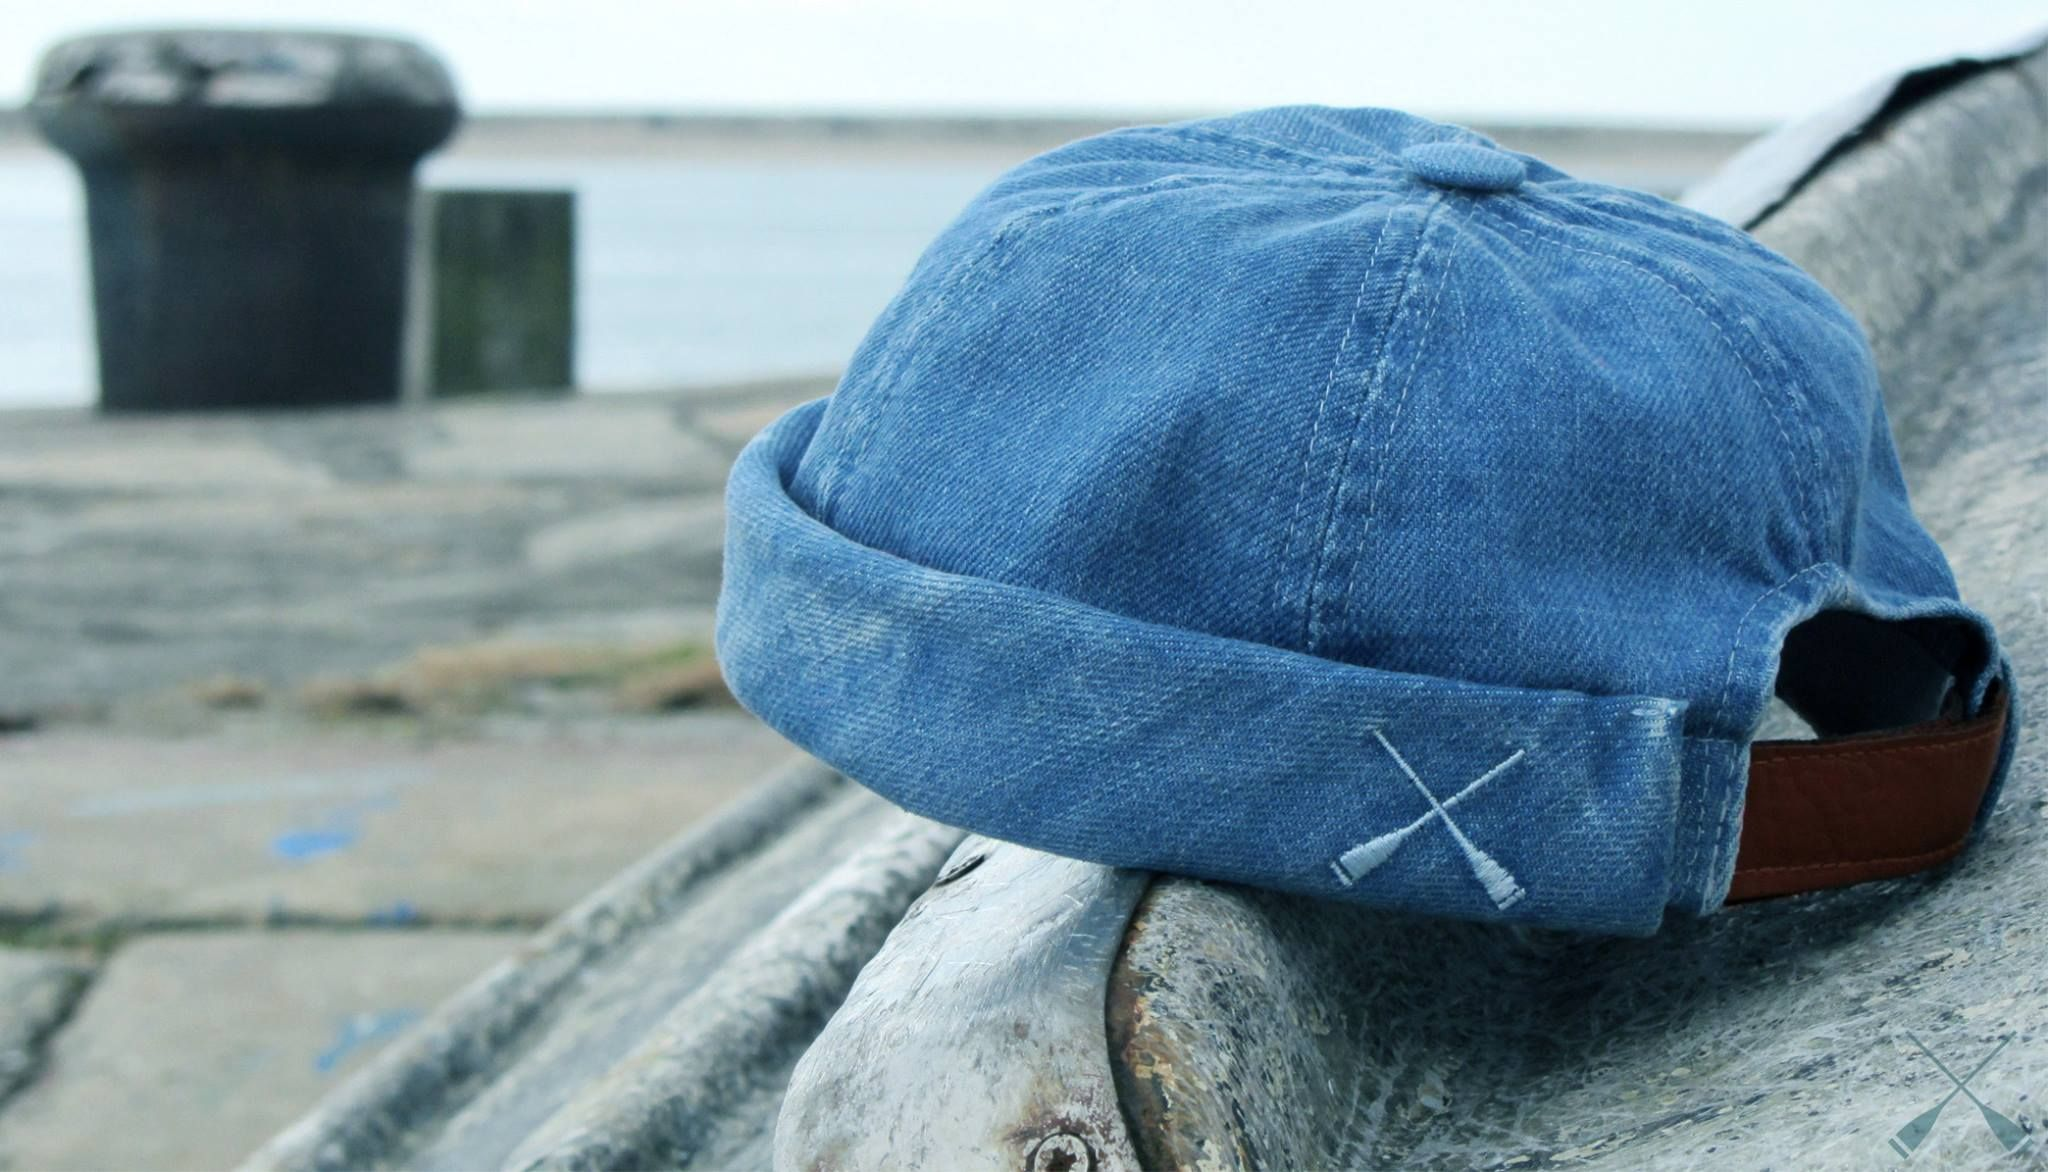 719e2513877 Beton Cire Washed Denim Miki Cap Menswear Hats